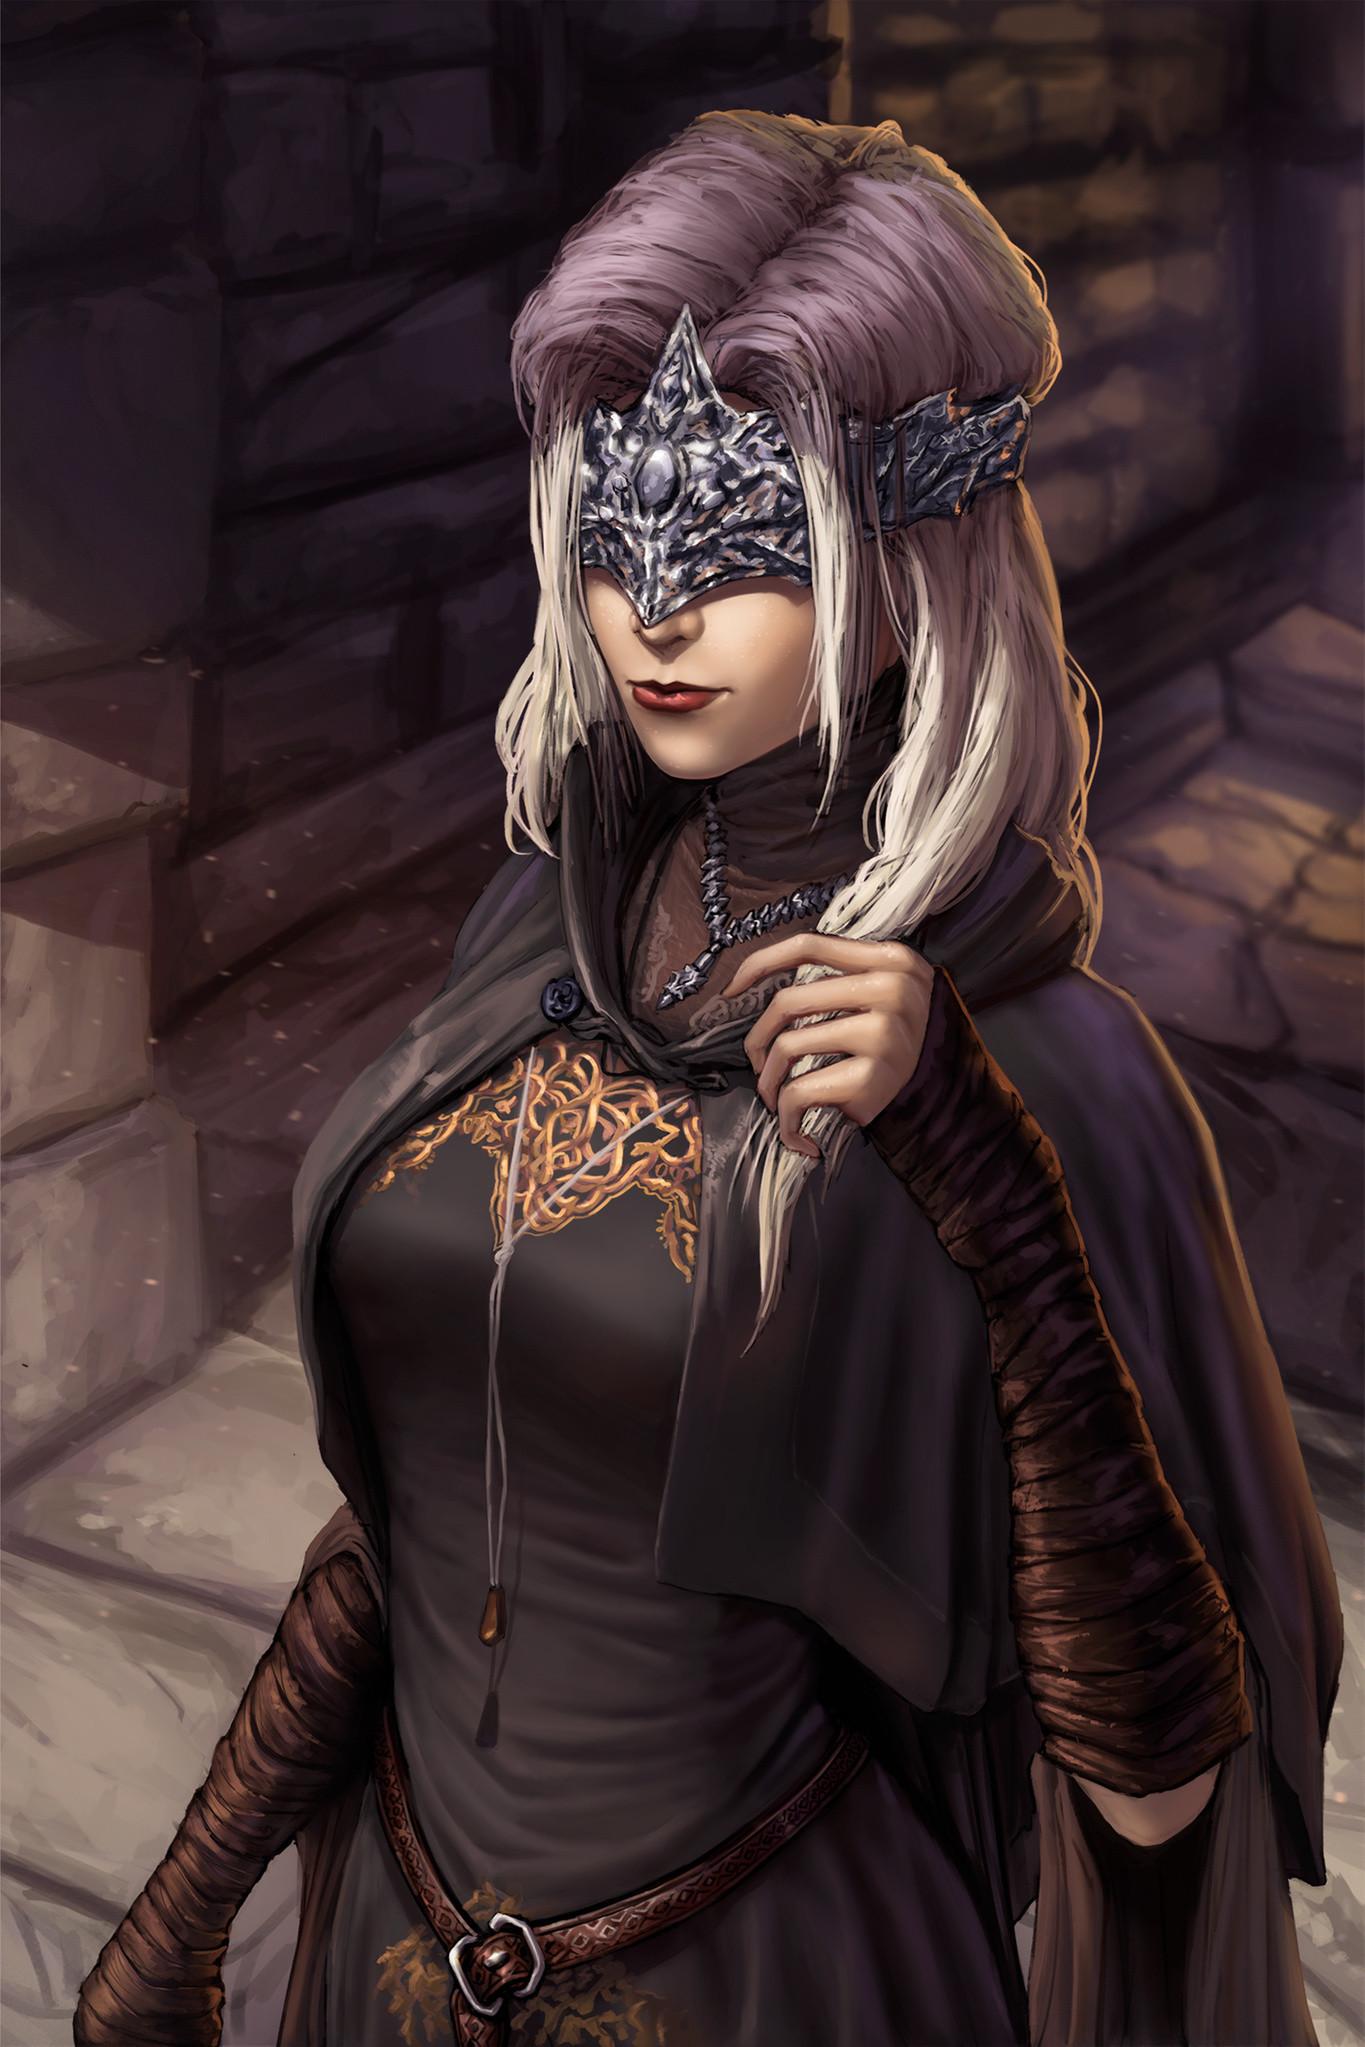 Dark Souls 3 - Dark Souls 3